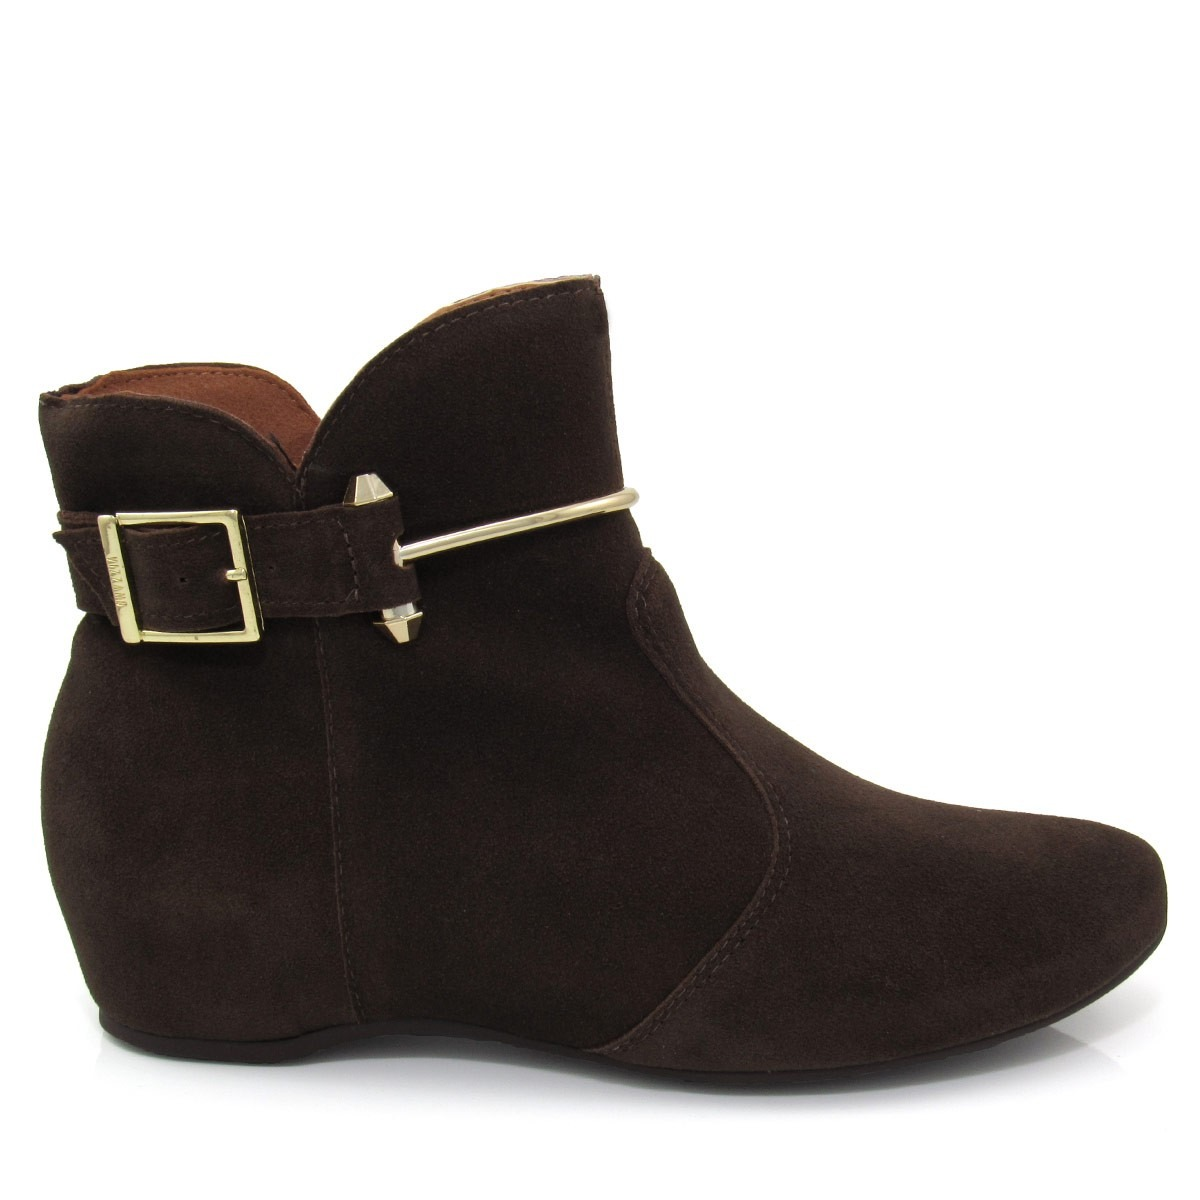 467e5730c bota feminina cano curto vizzano 3043113 marrom. Carregando zoom.